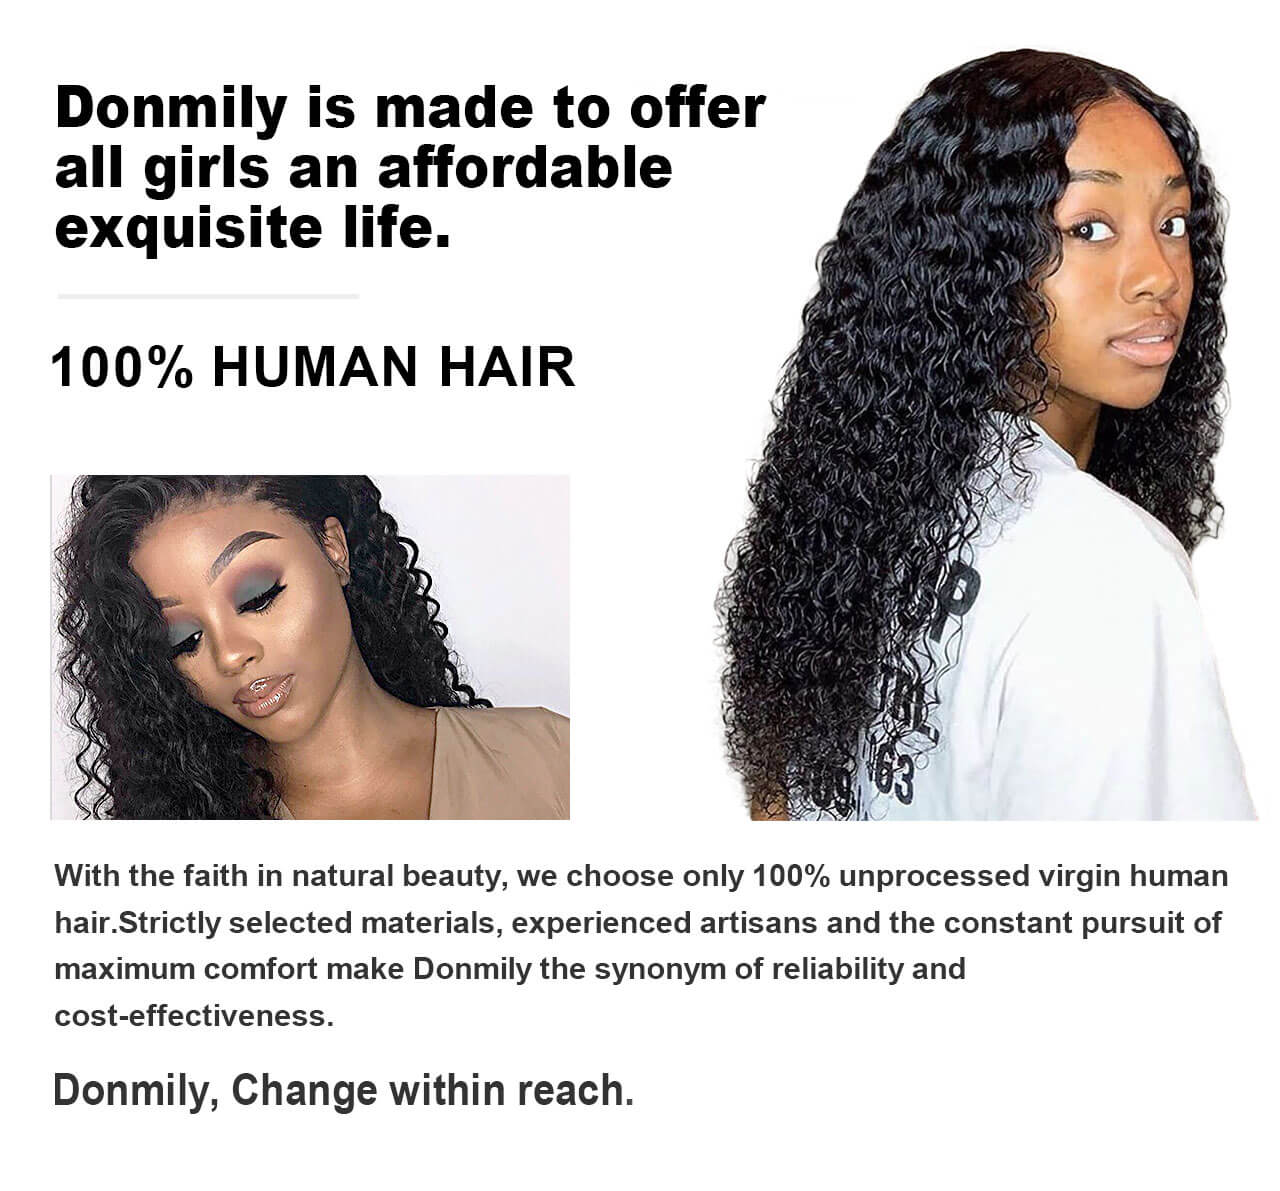 donmily 100% human hair